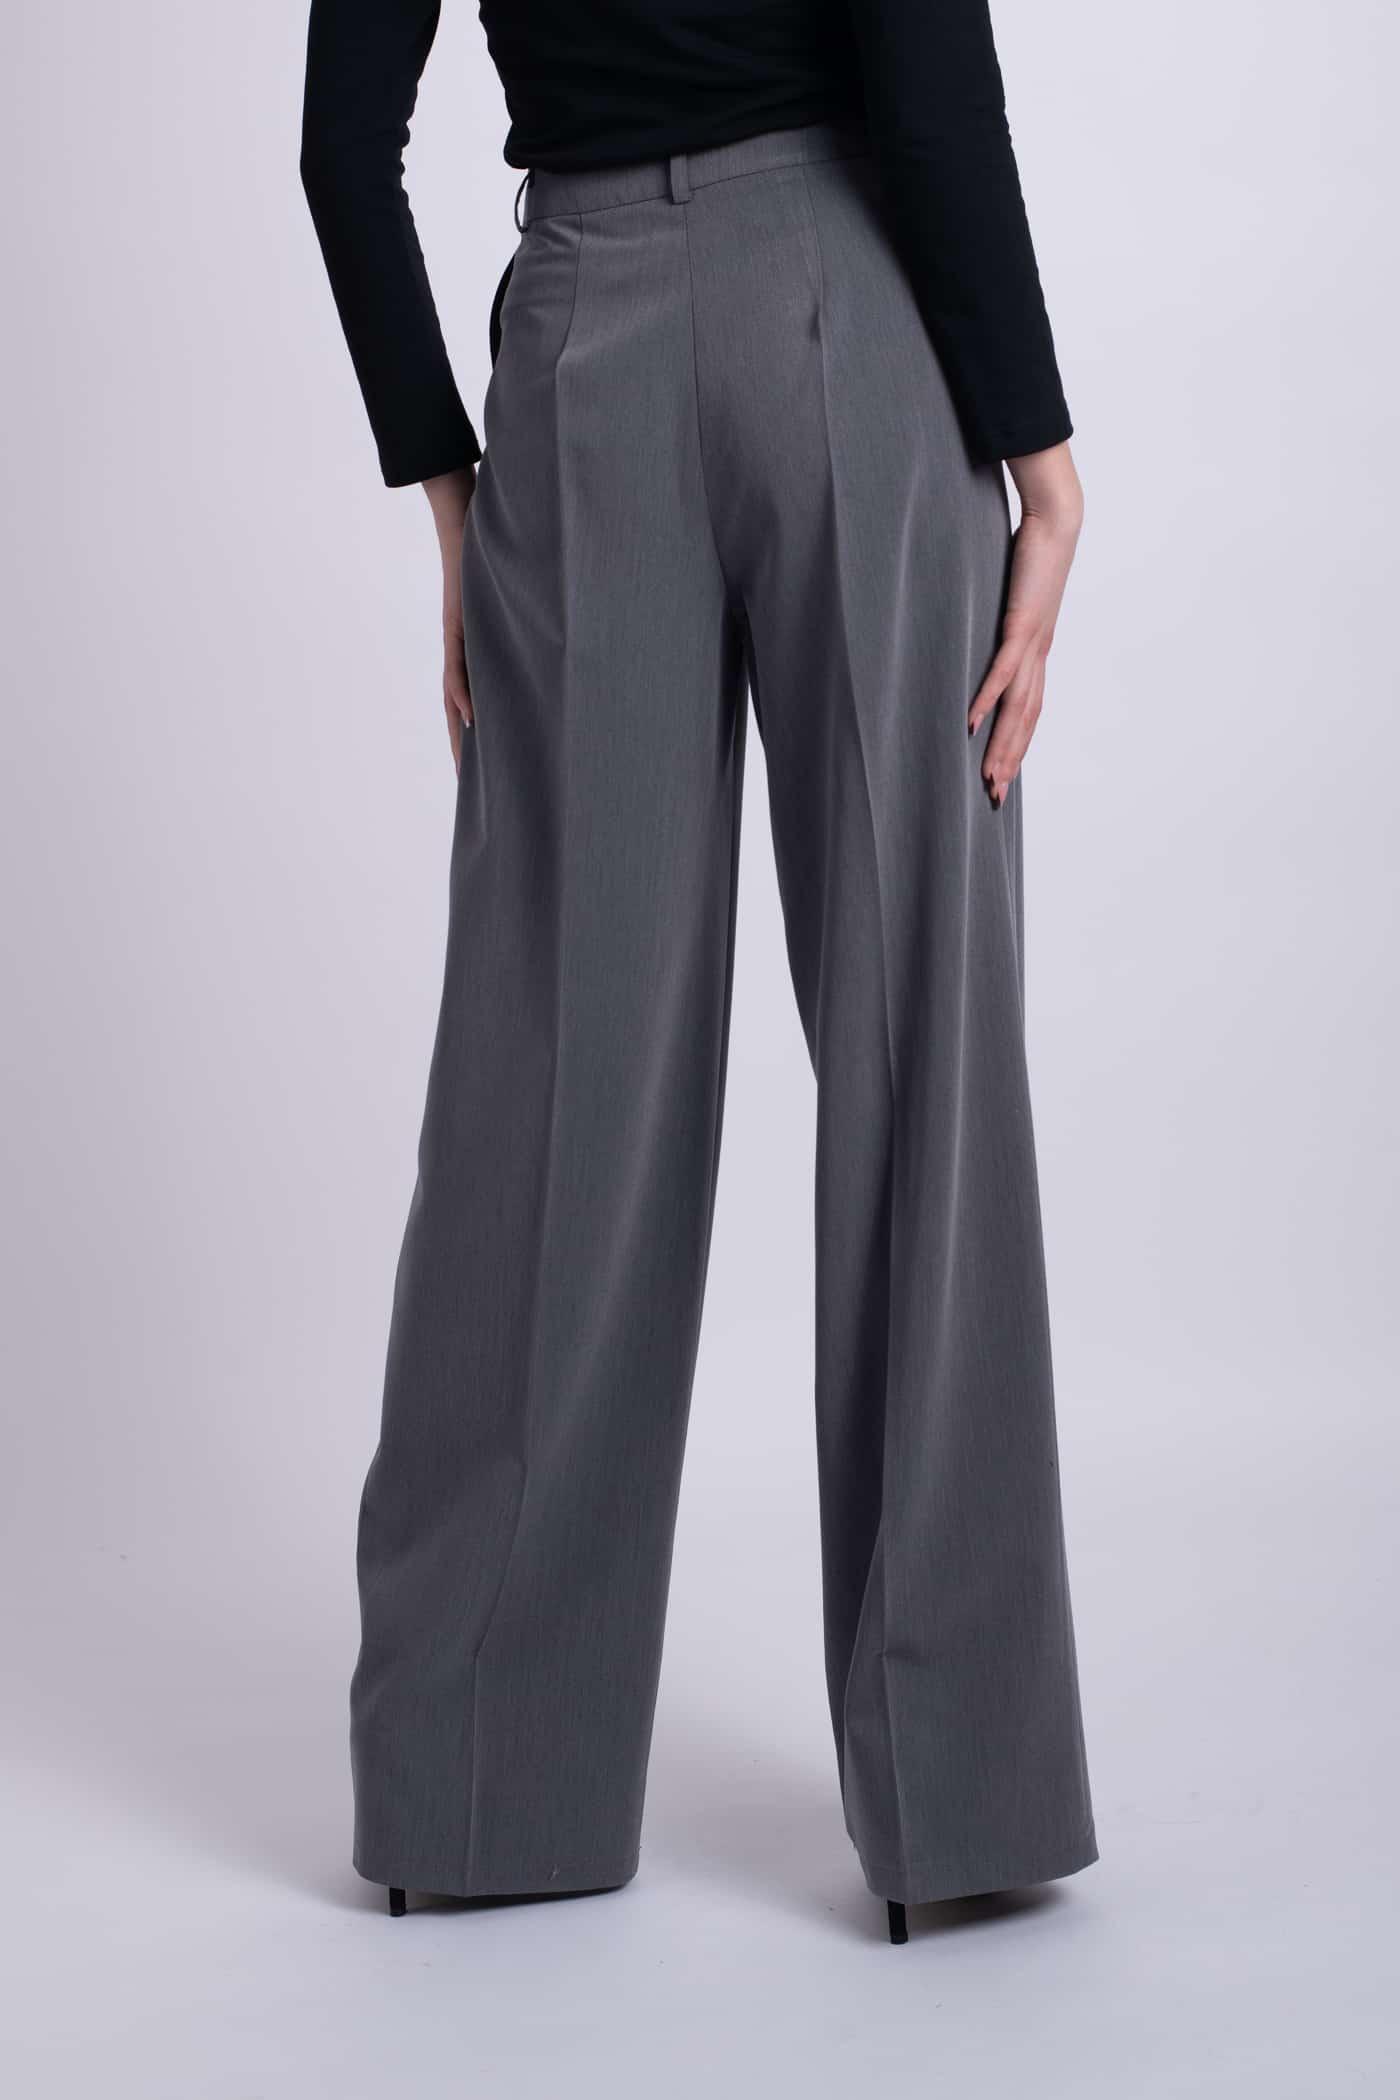 pantaloni gri ladonna